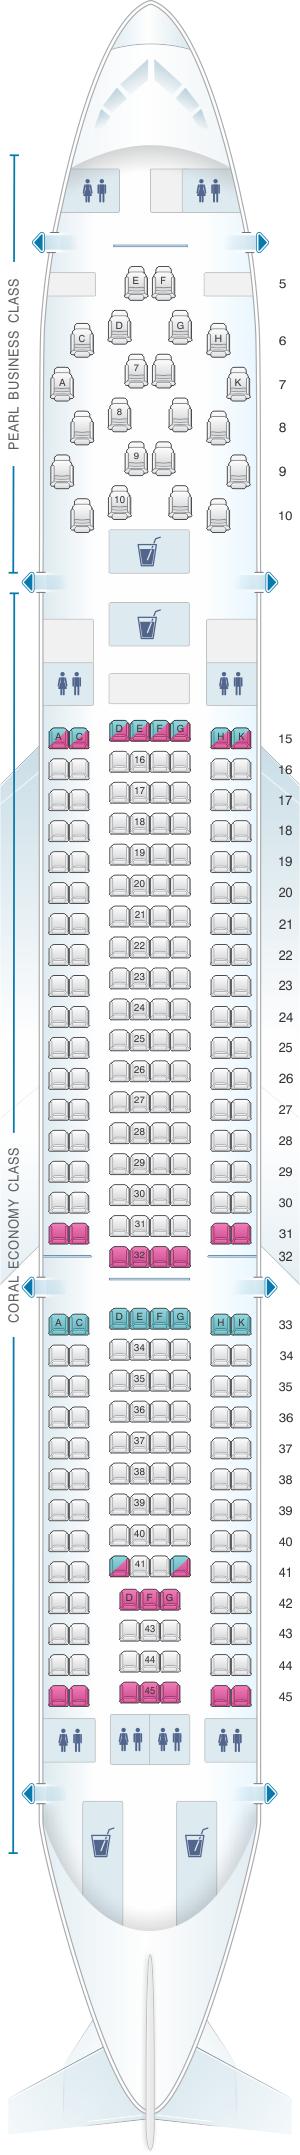 Seat map for Etihad Airways Airbus A330 200